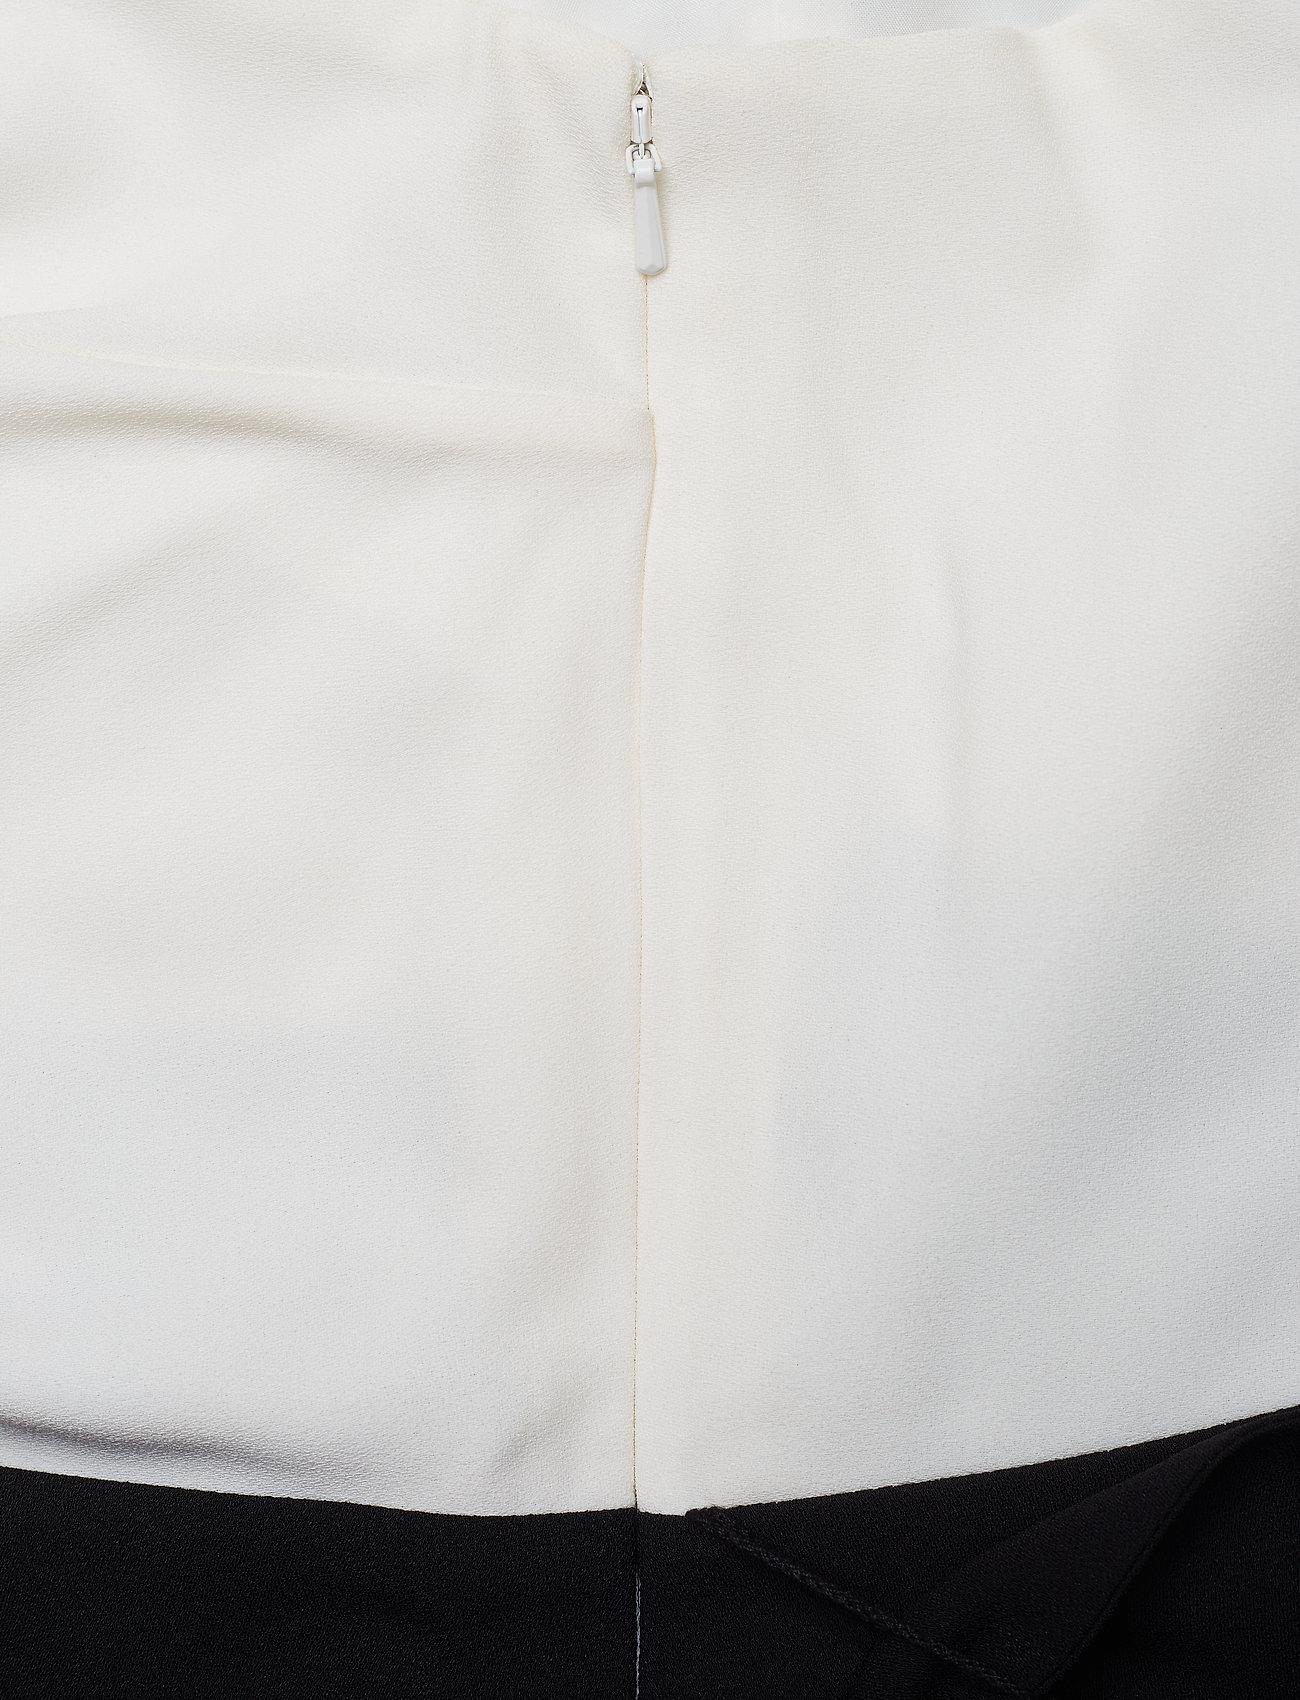 One NoveltyBanana Cropped Jumpsuitblack Shldr White Republic Colorblocked yvYgb7f6